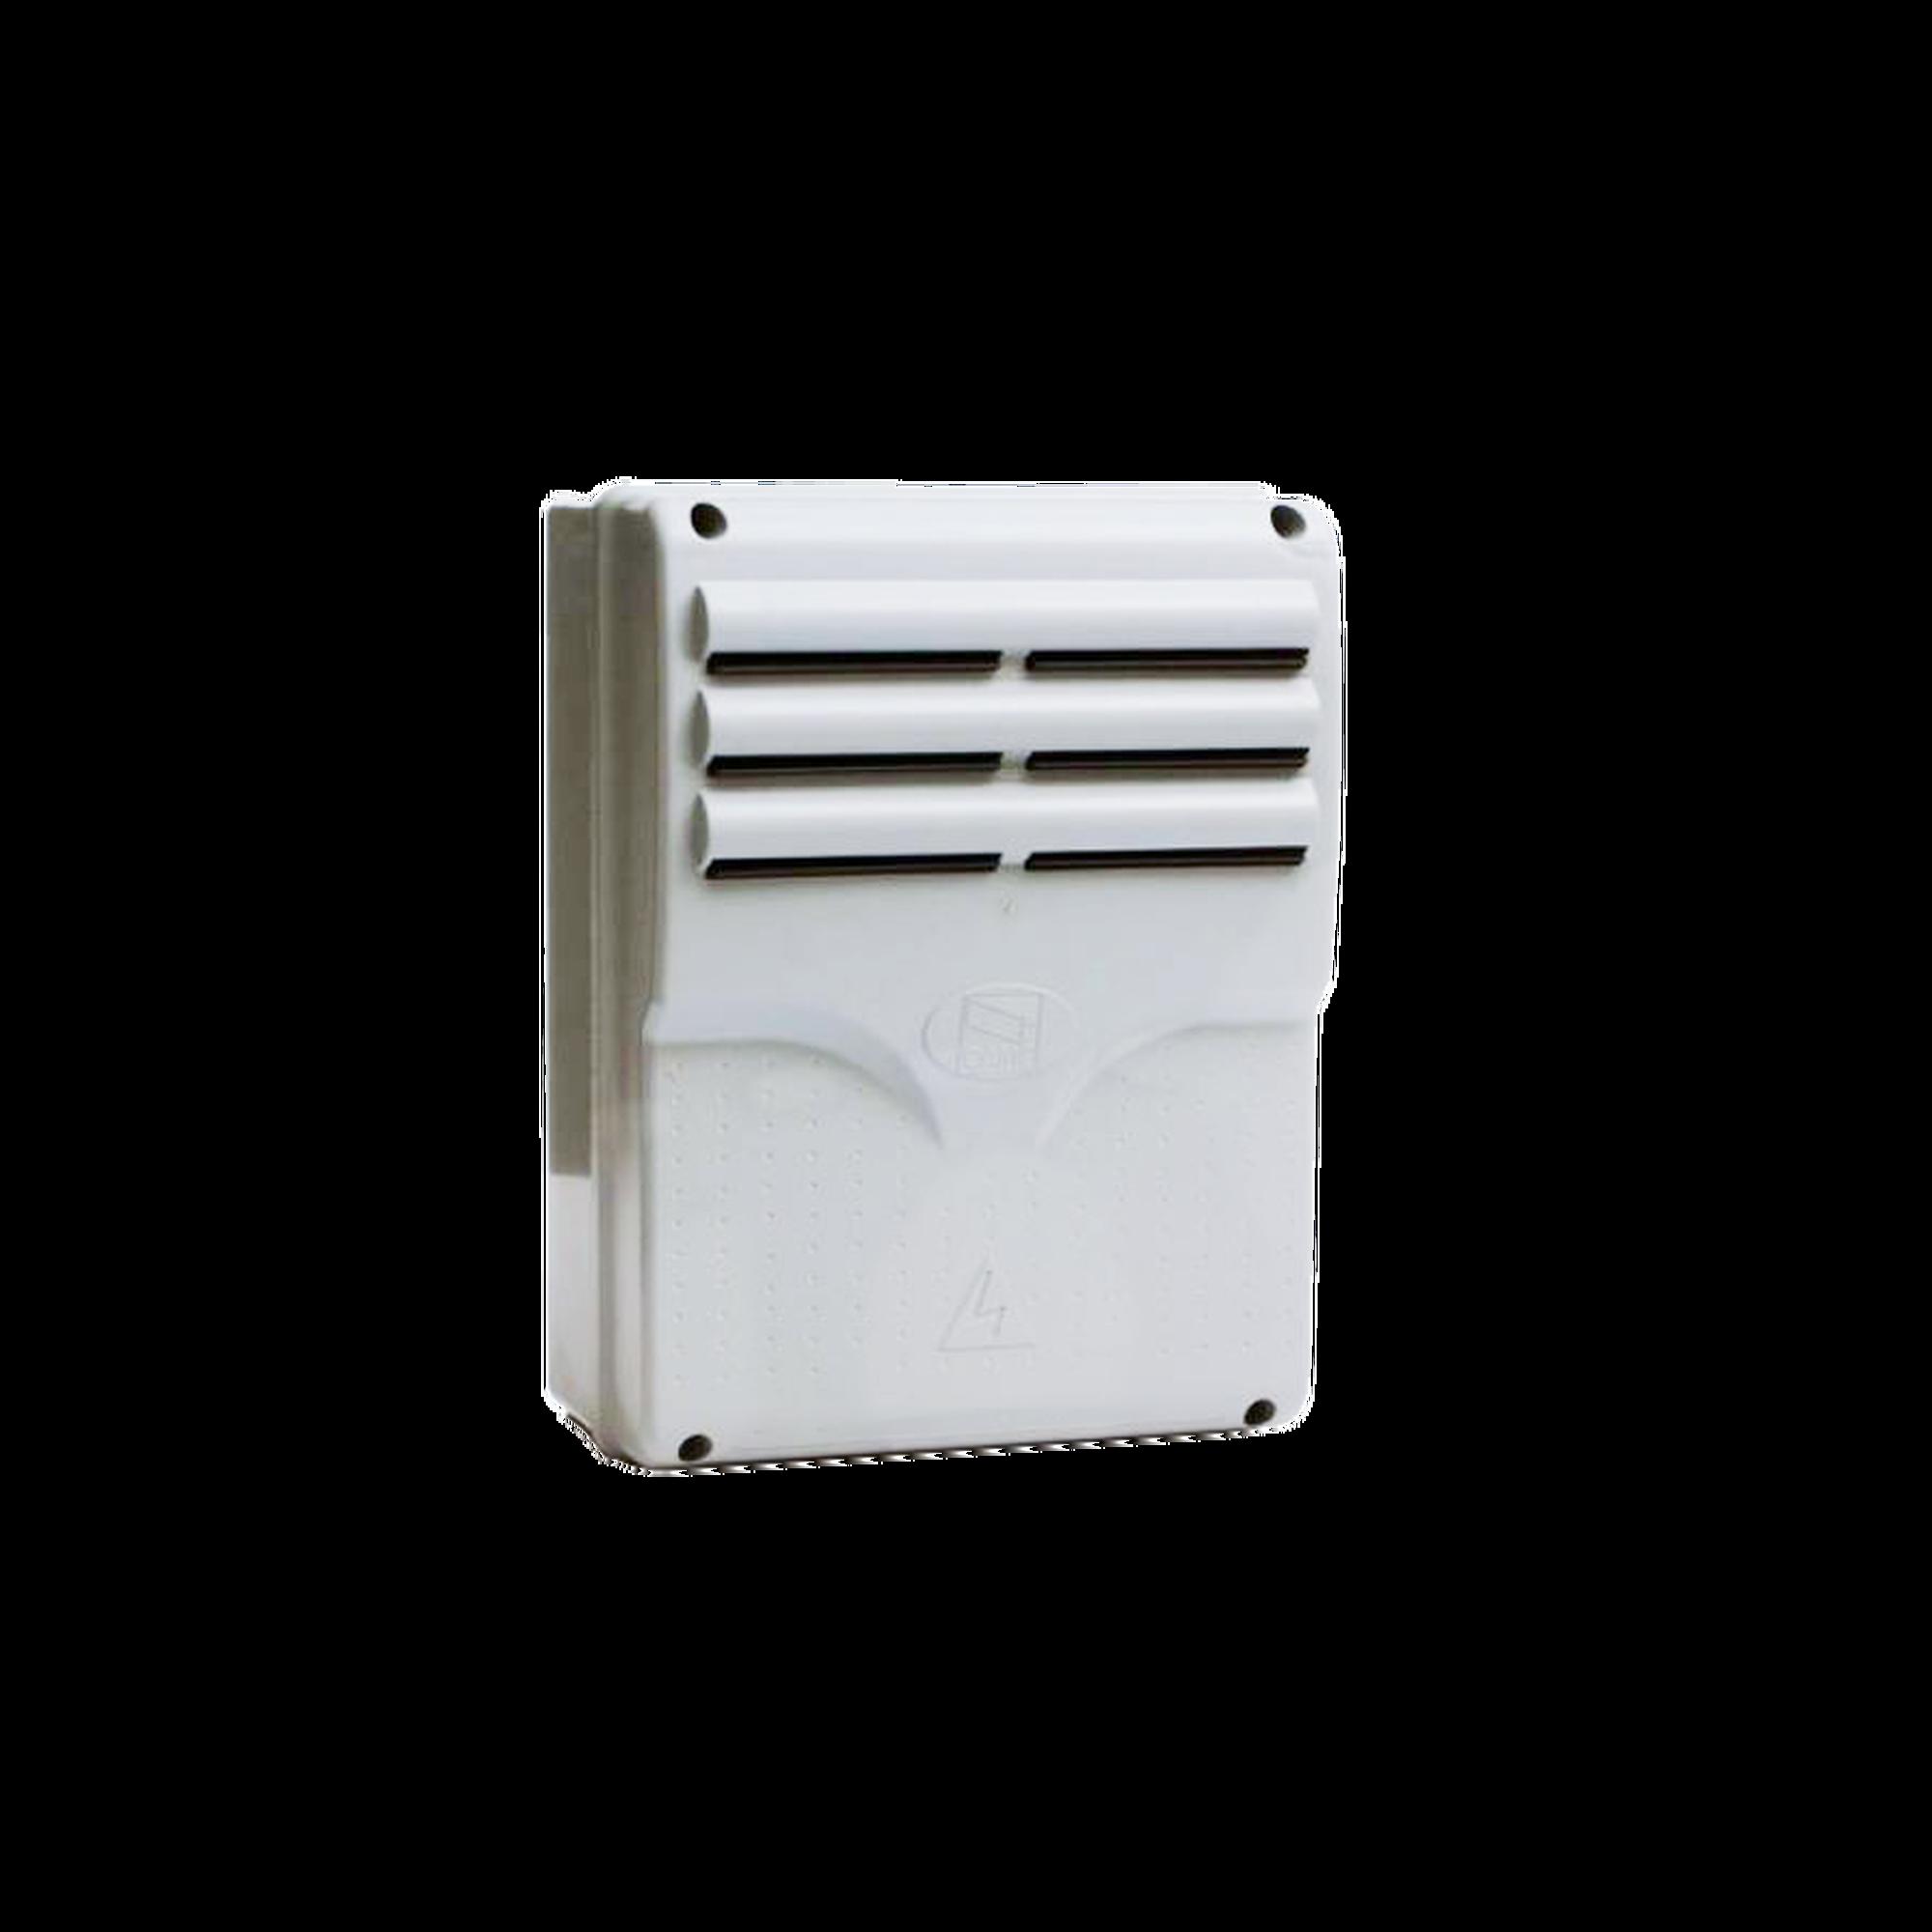 Contenedor para cuadro de mando de equipos AXO